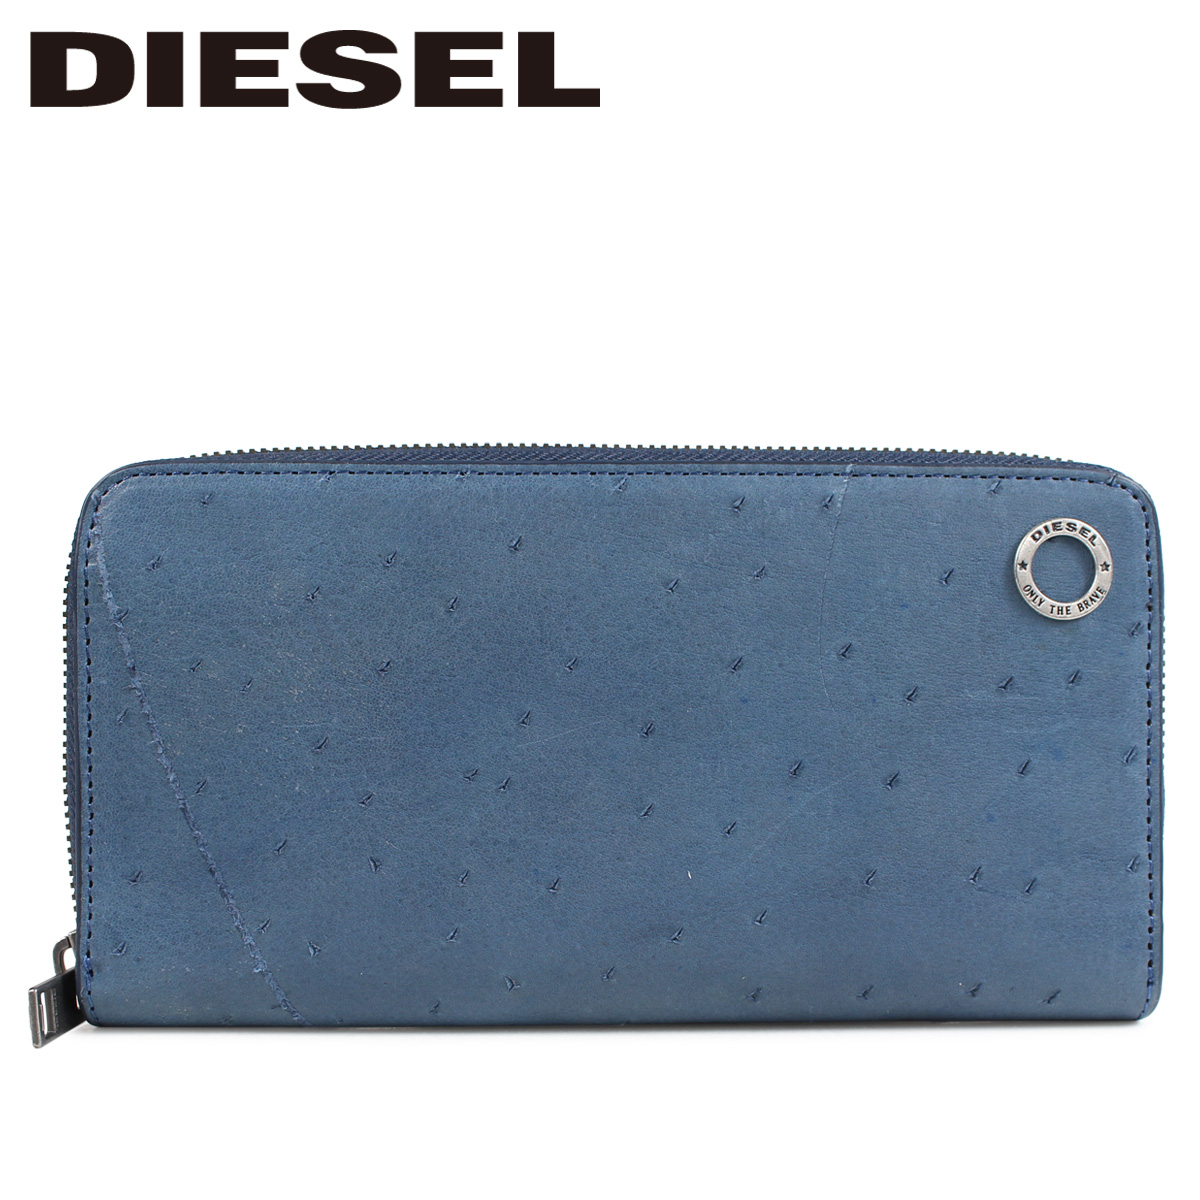 DIESEL KURACAO 24 ZIP ディーゼル 財布 長財布 メンズ ラウンドファスナー ブルー X05824 PR080